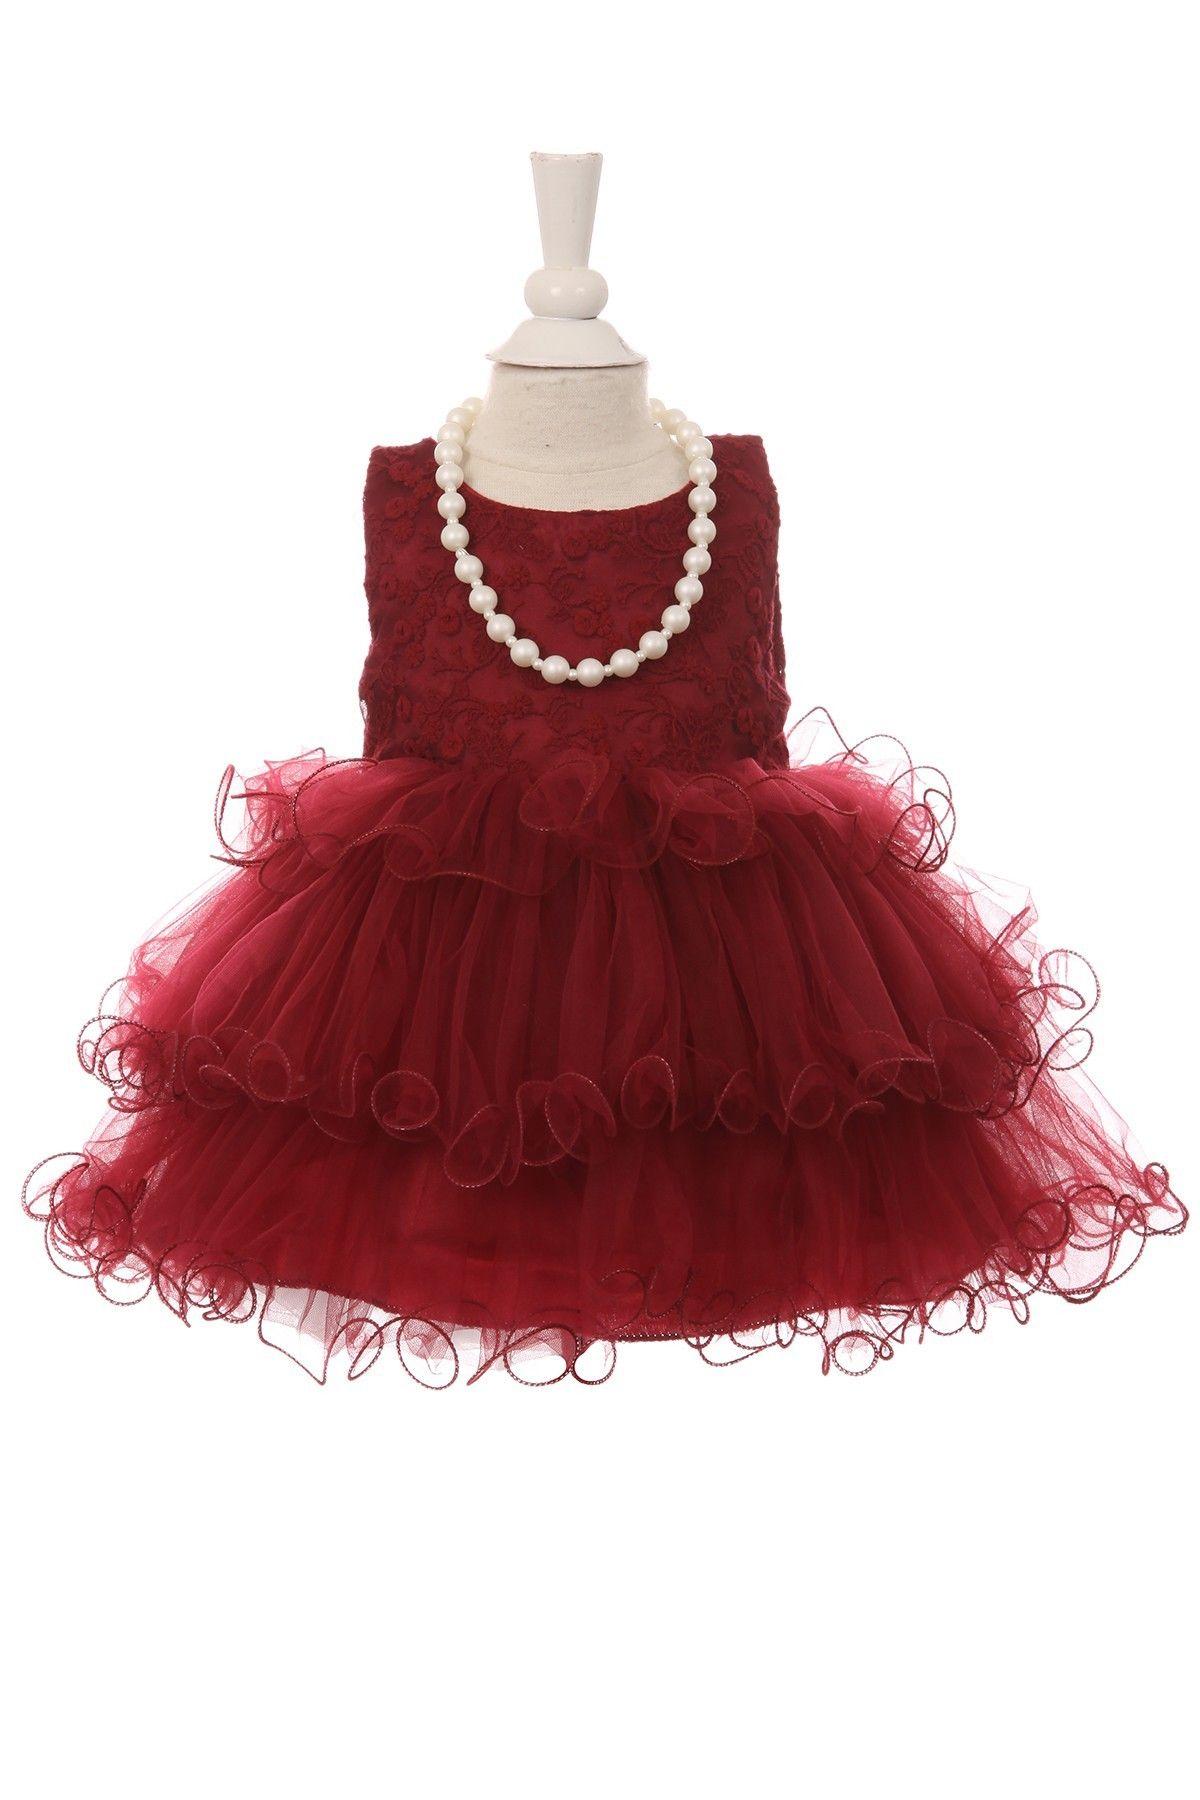 1991eca205ac Infant Christmas dress. Burgundy baby dress with beads and tutu skirt,  perfect selection for Christmas. #tutudresses #babydresses